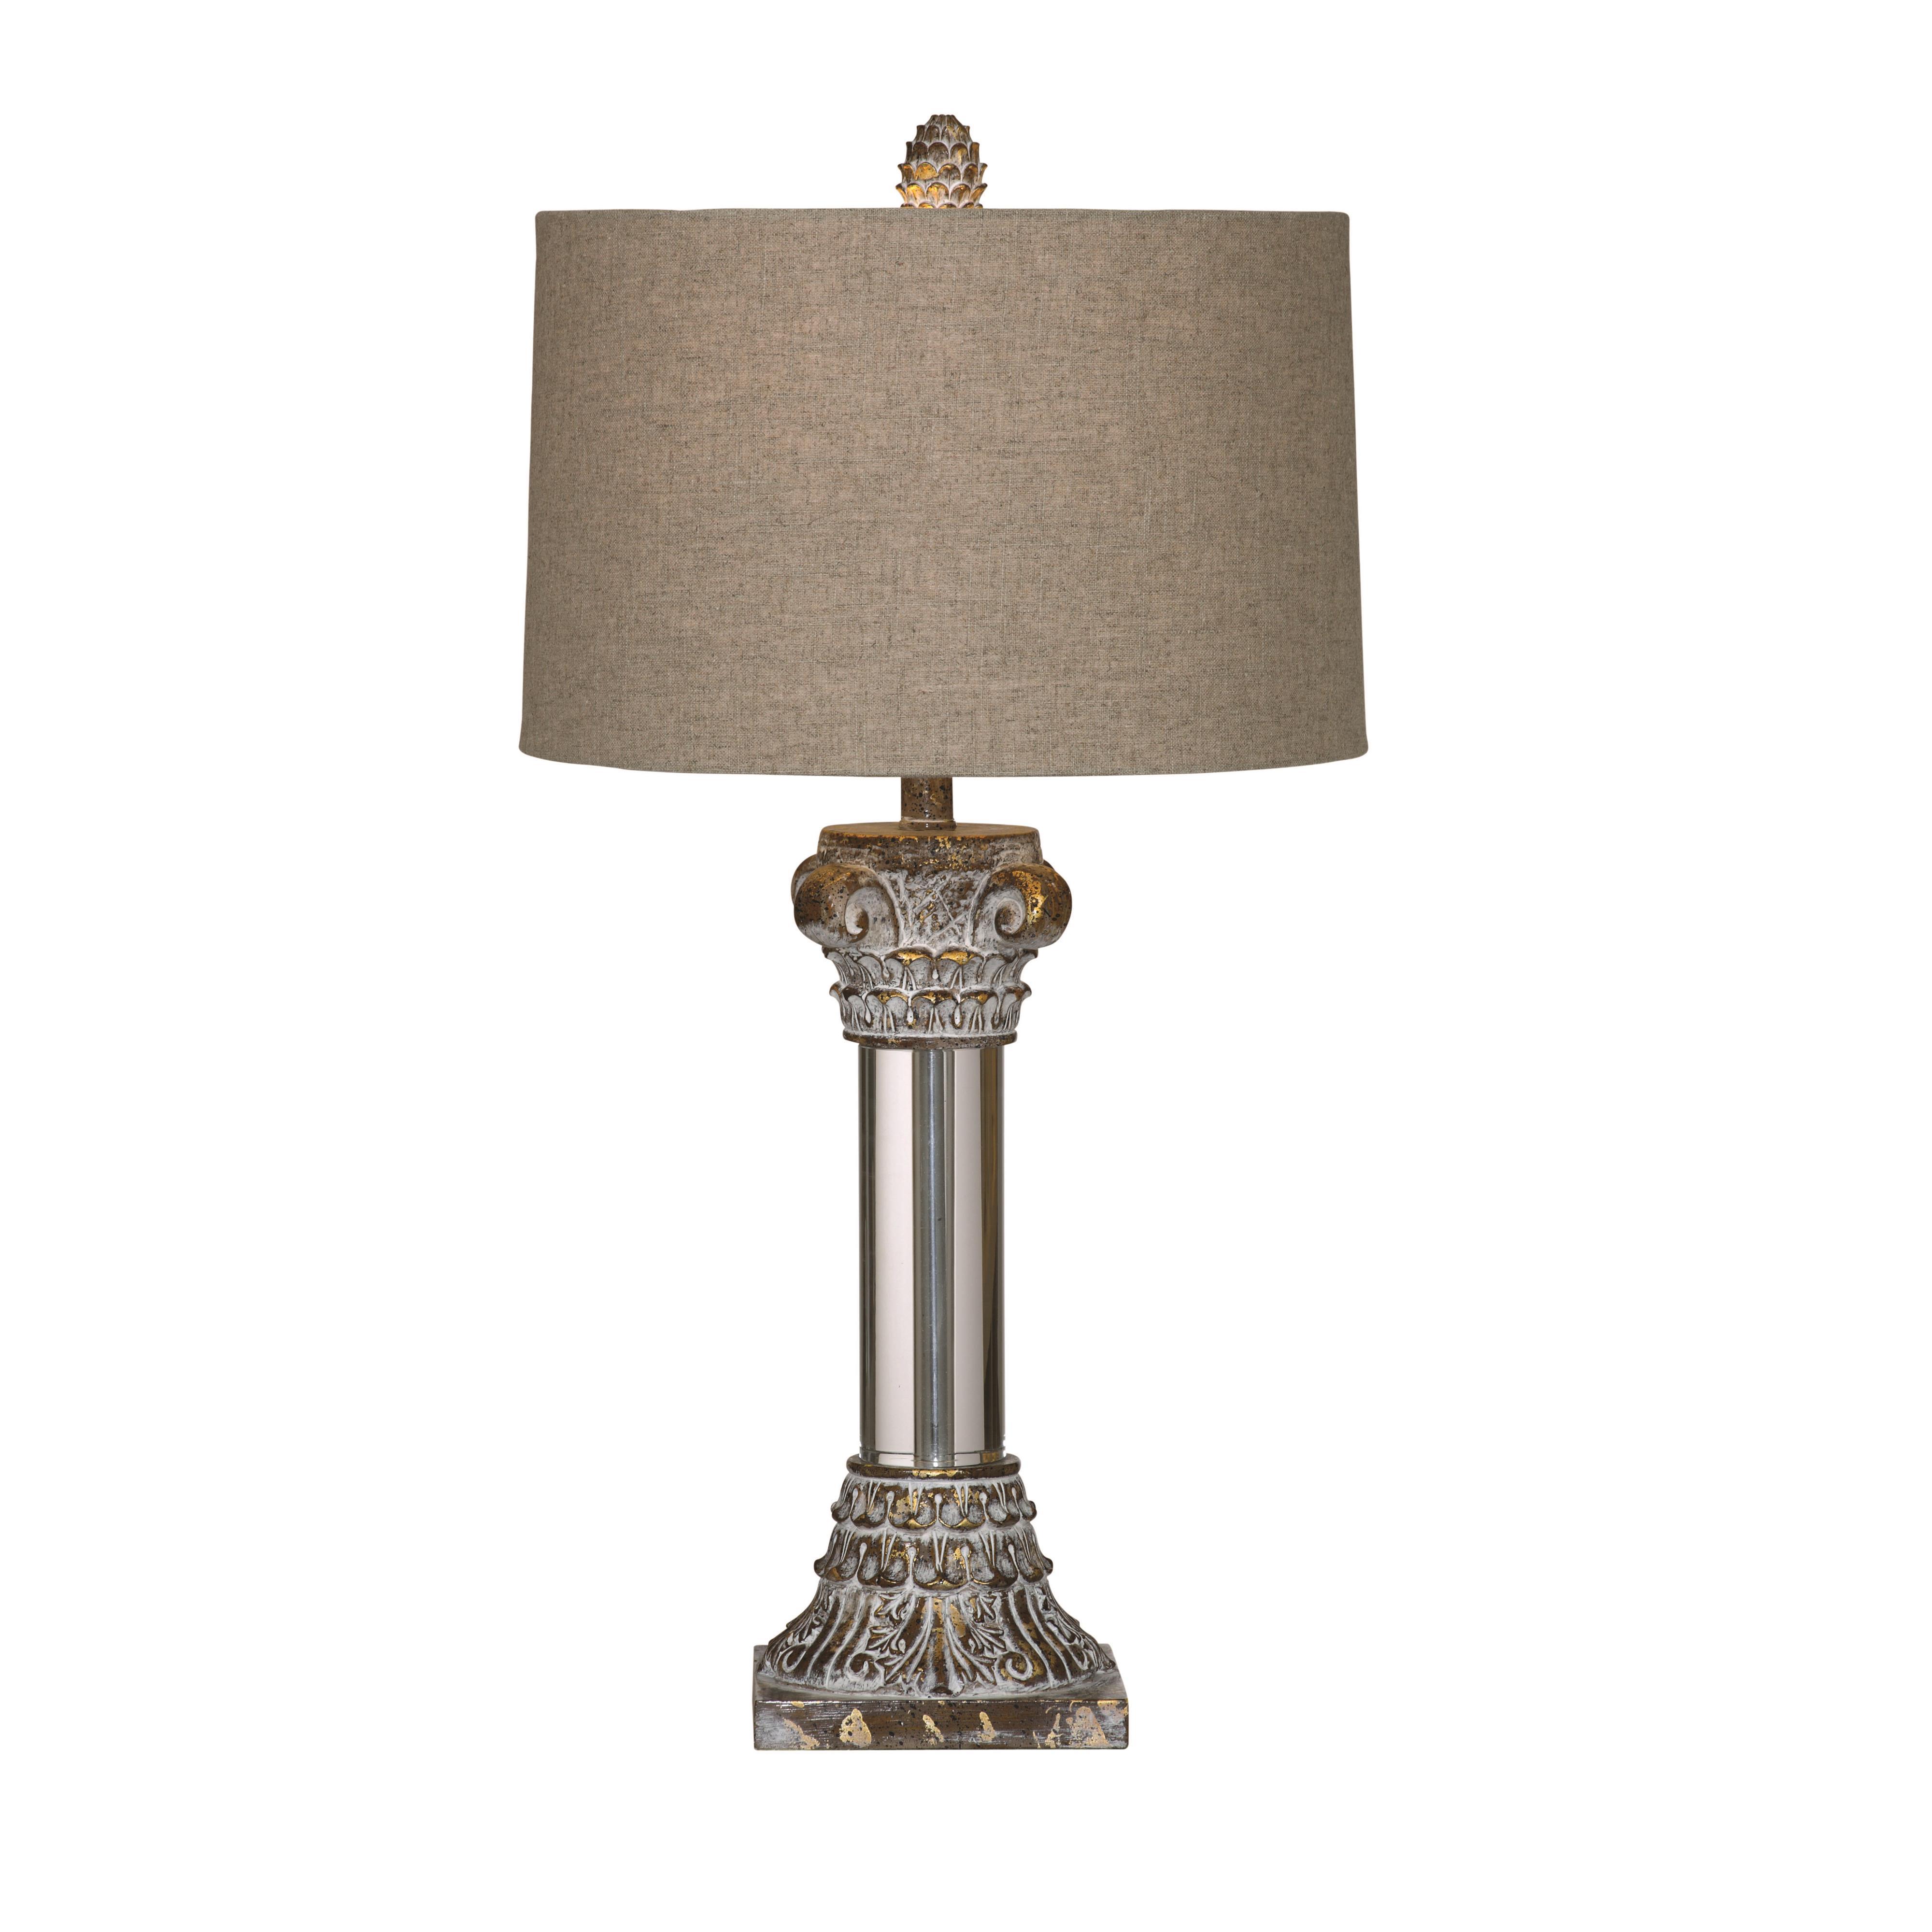 Corinth Table Lamp